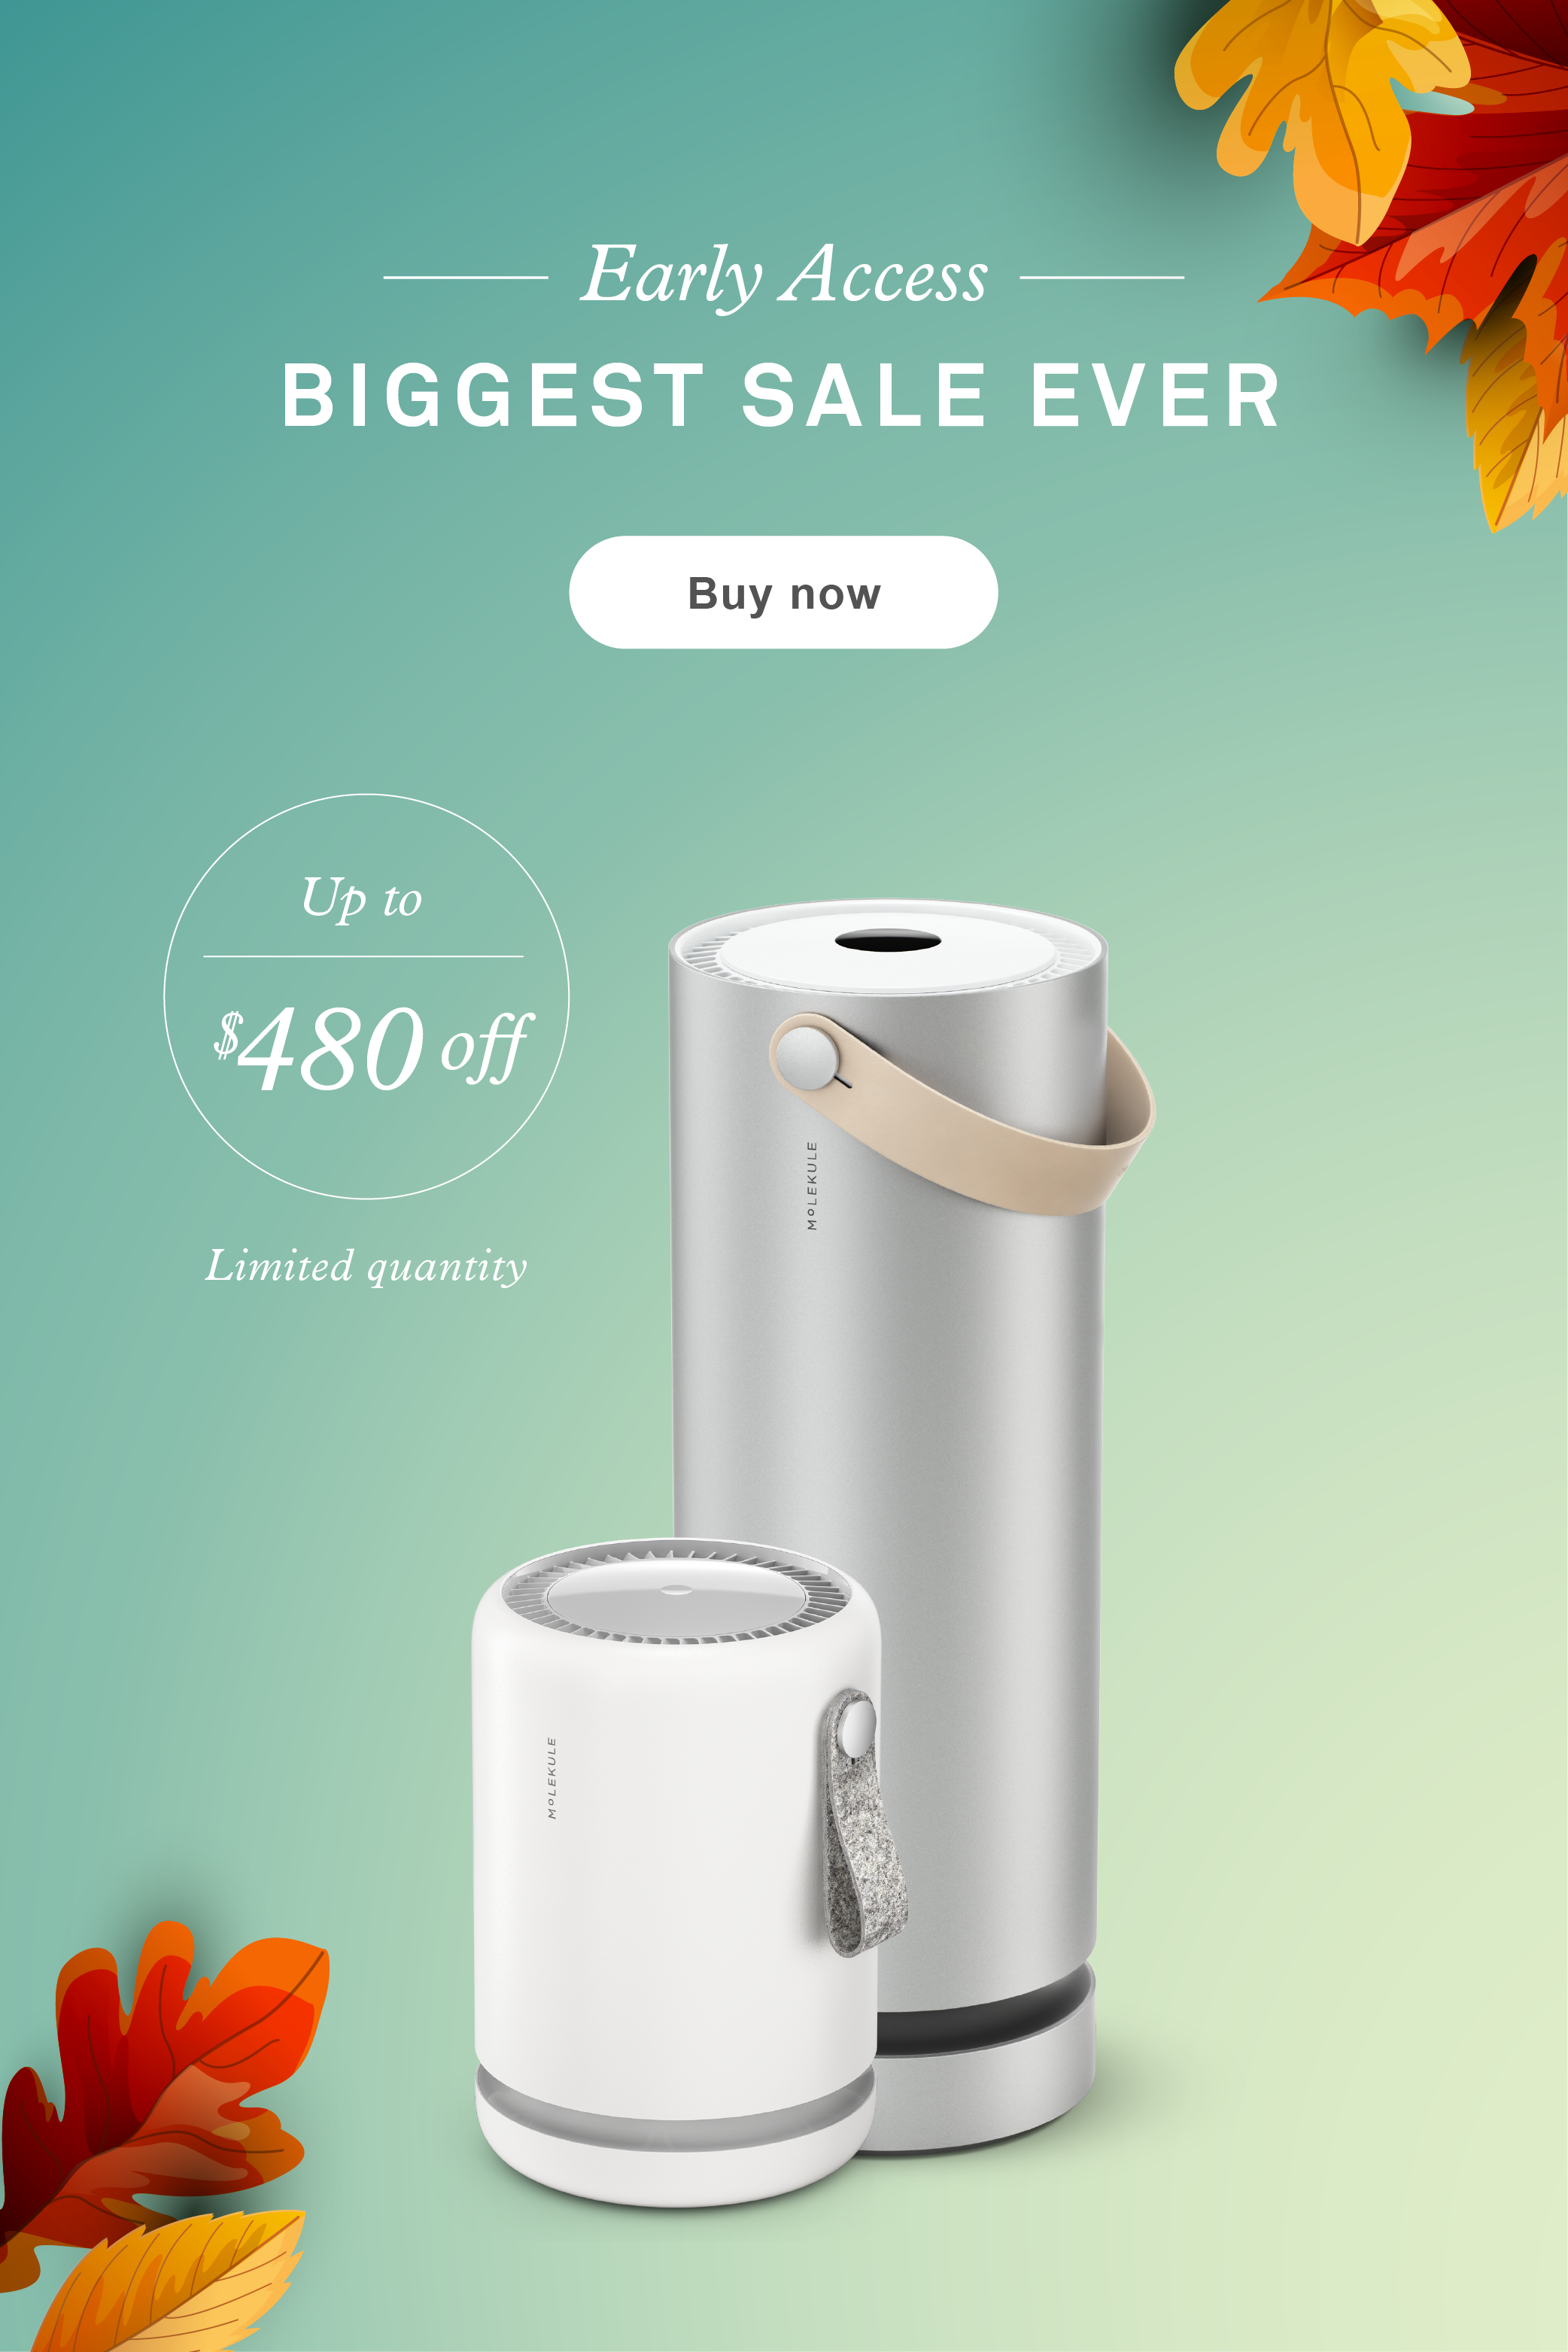 Save big this holiday season with Molekule's biggest sale